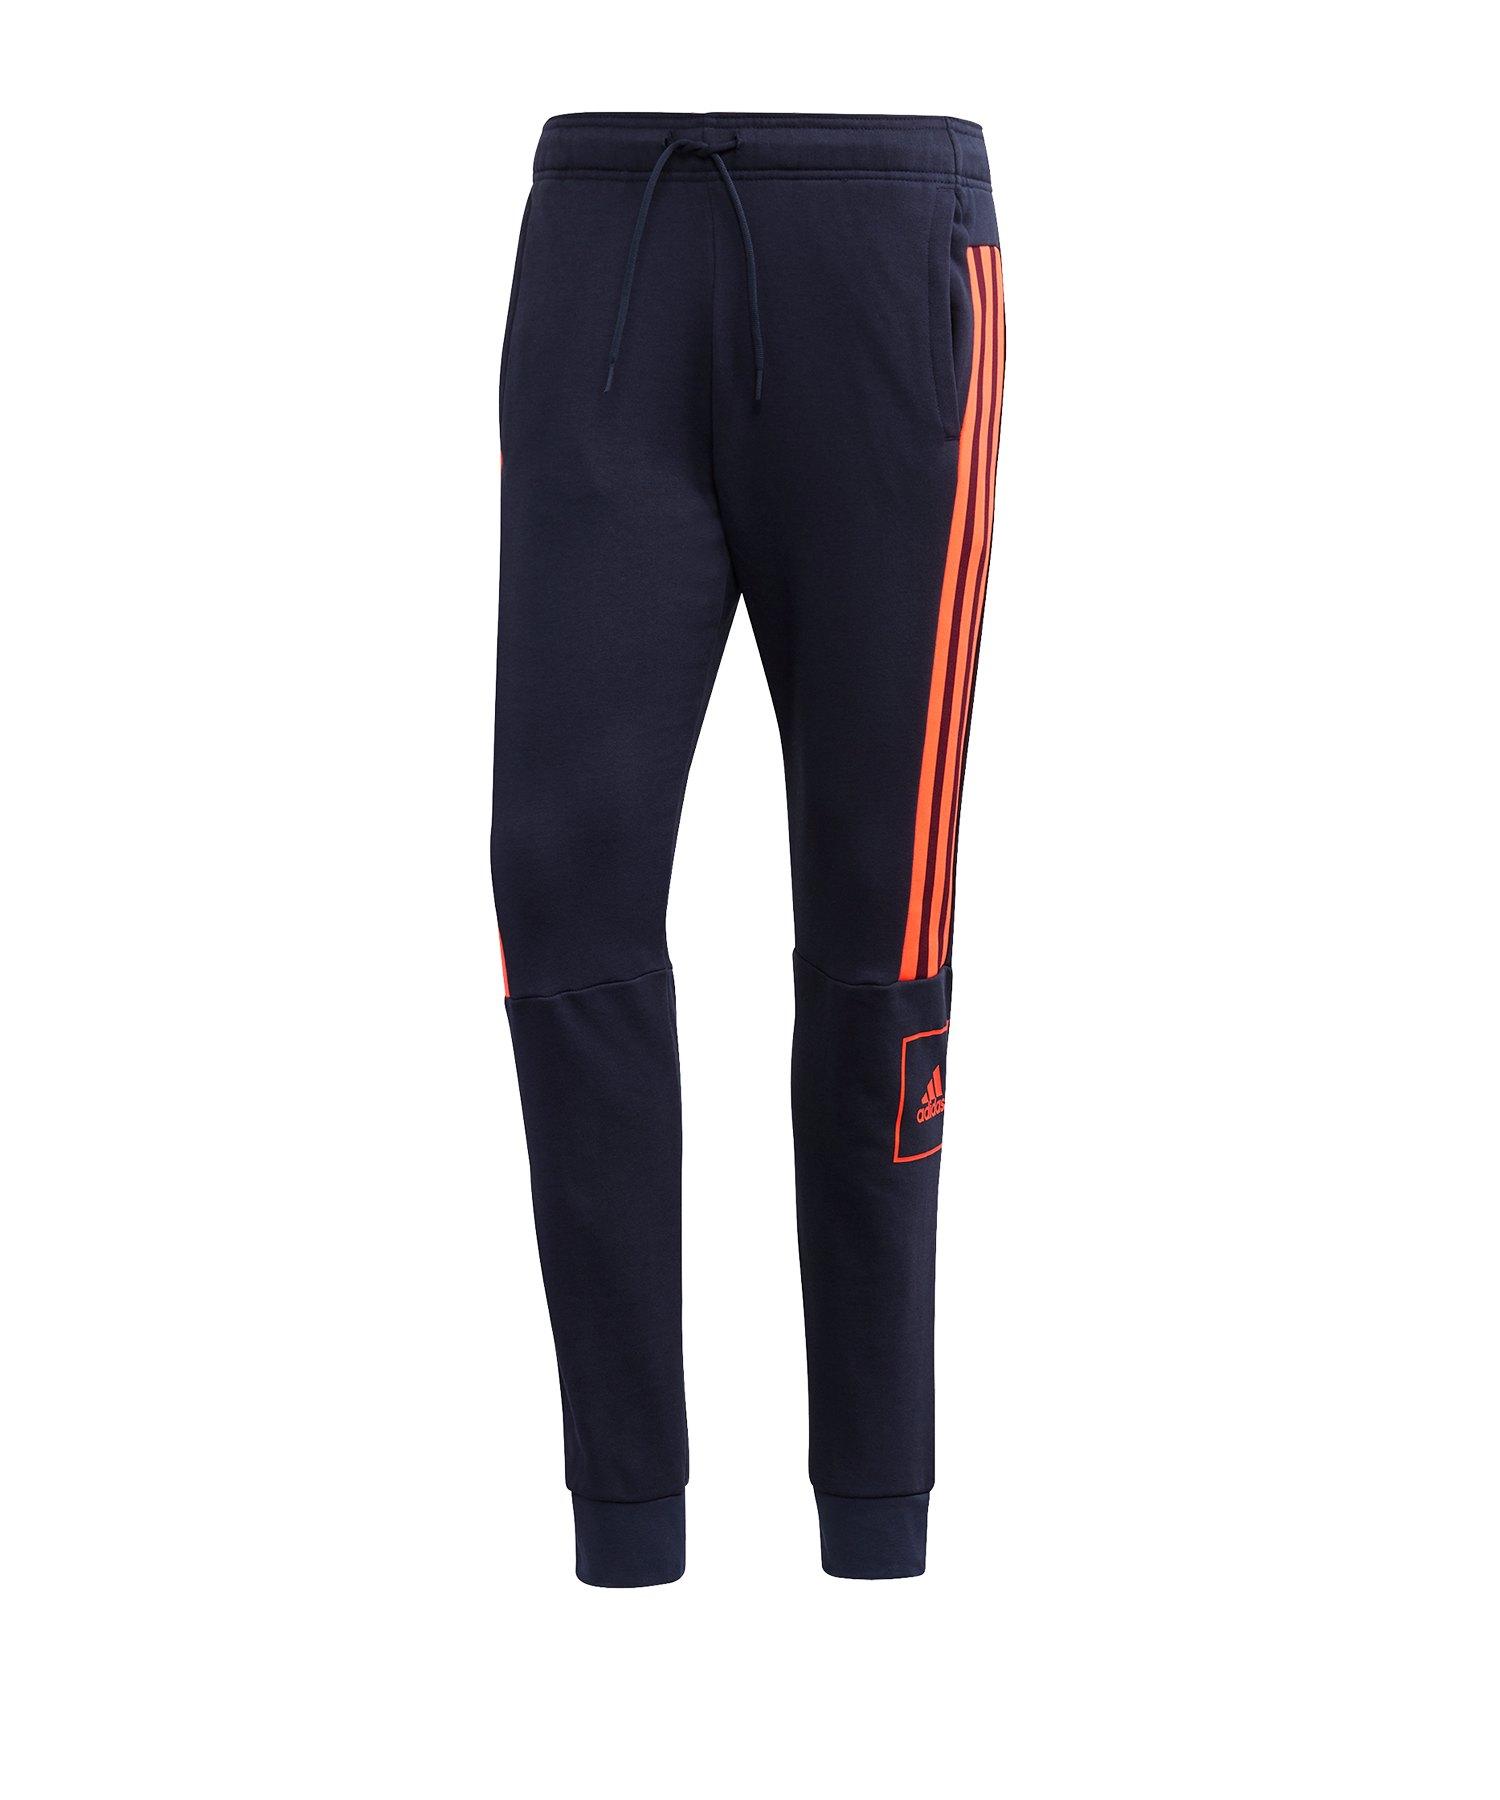 adidas 3S Pant Jogginghose lang Blau Rot - blau